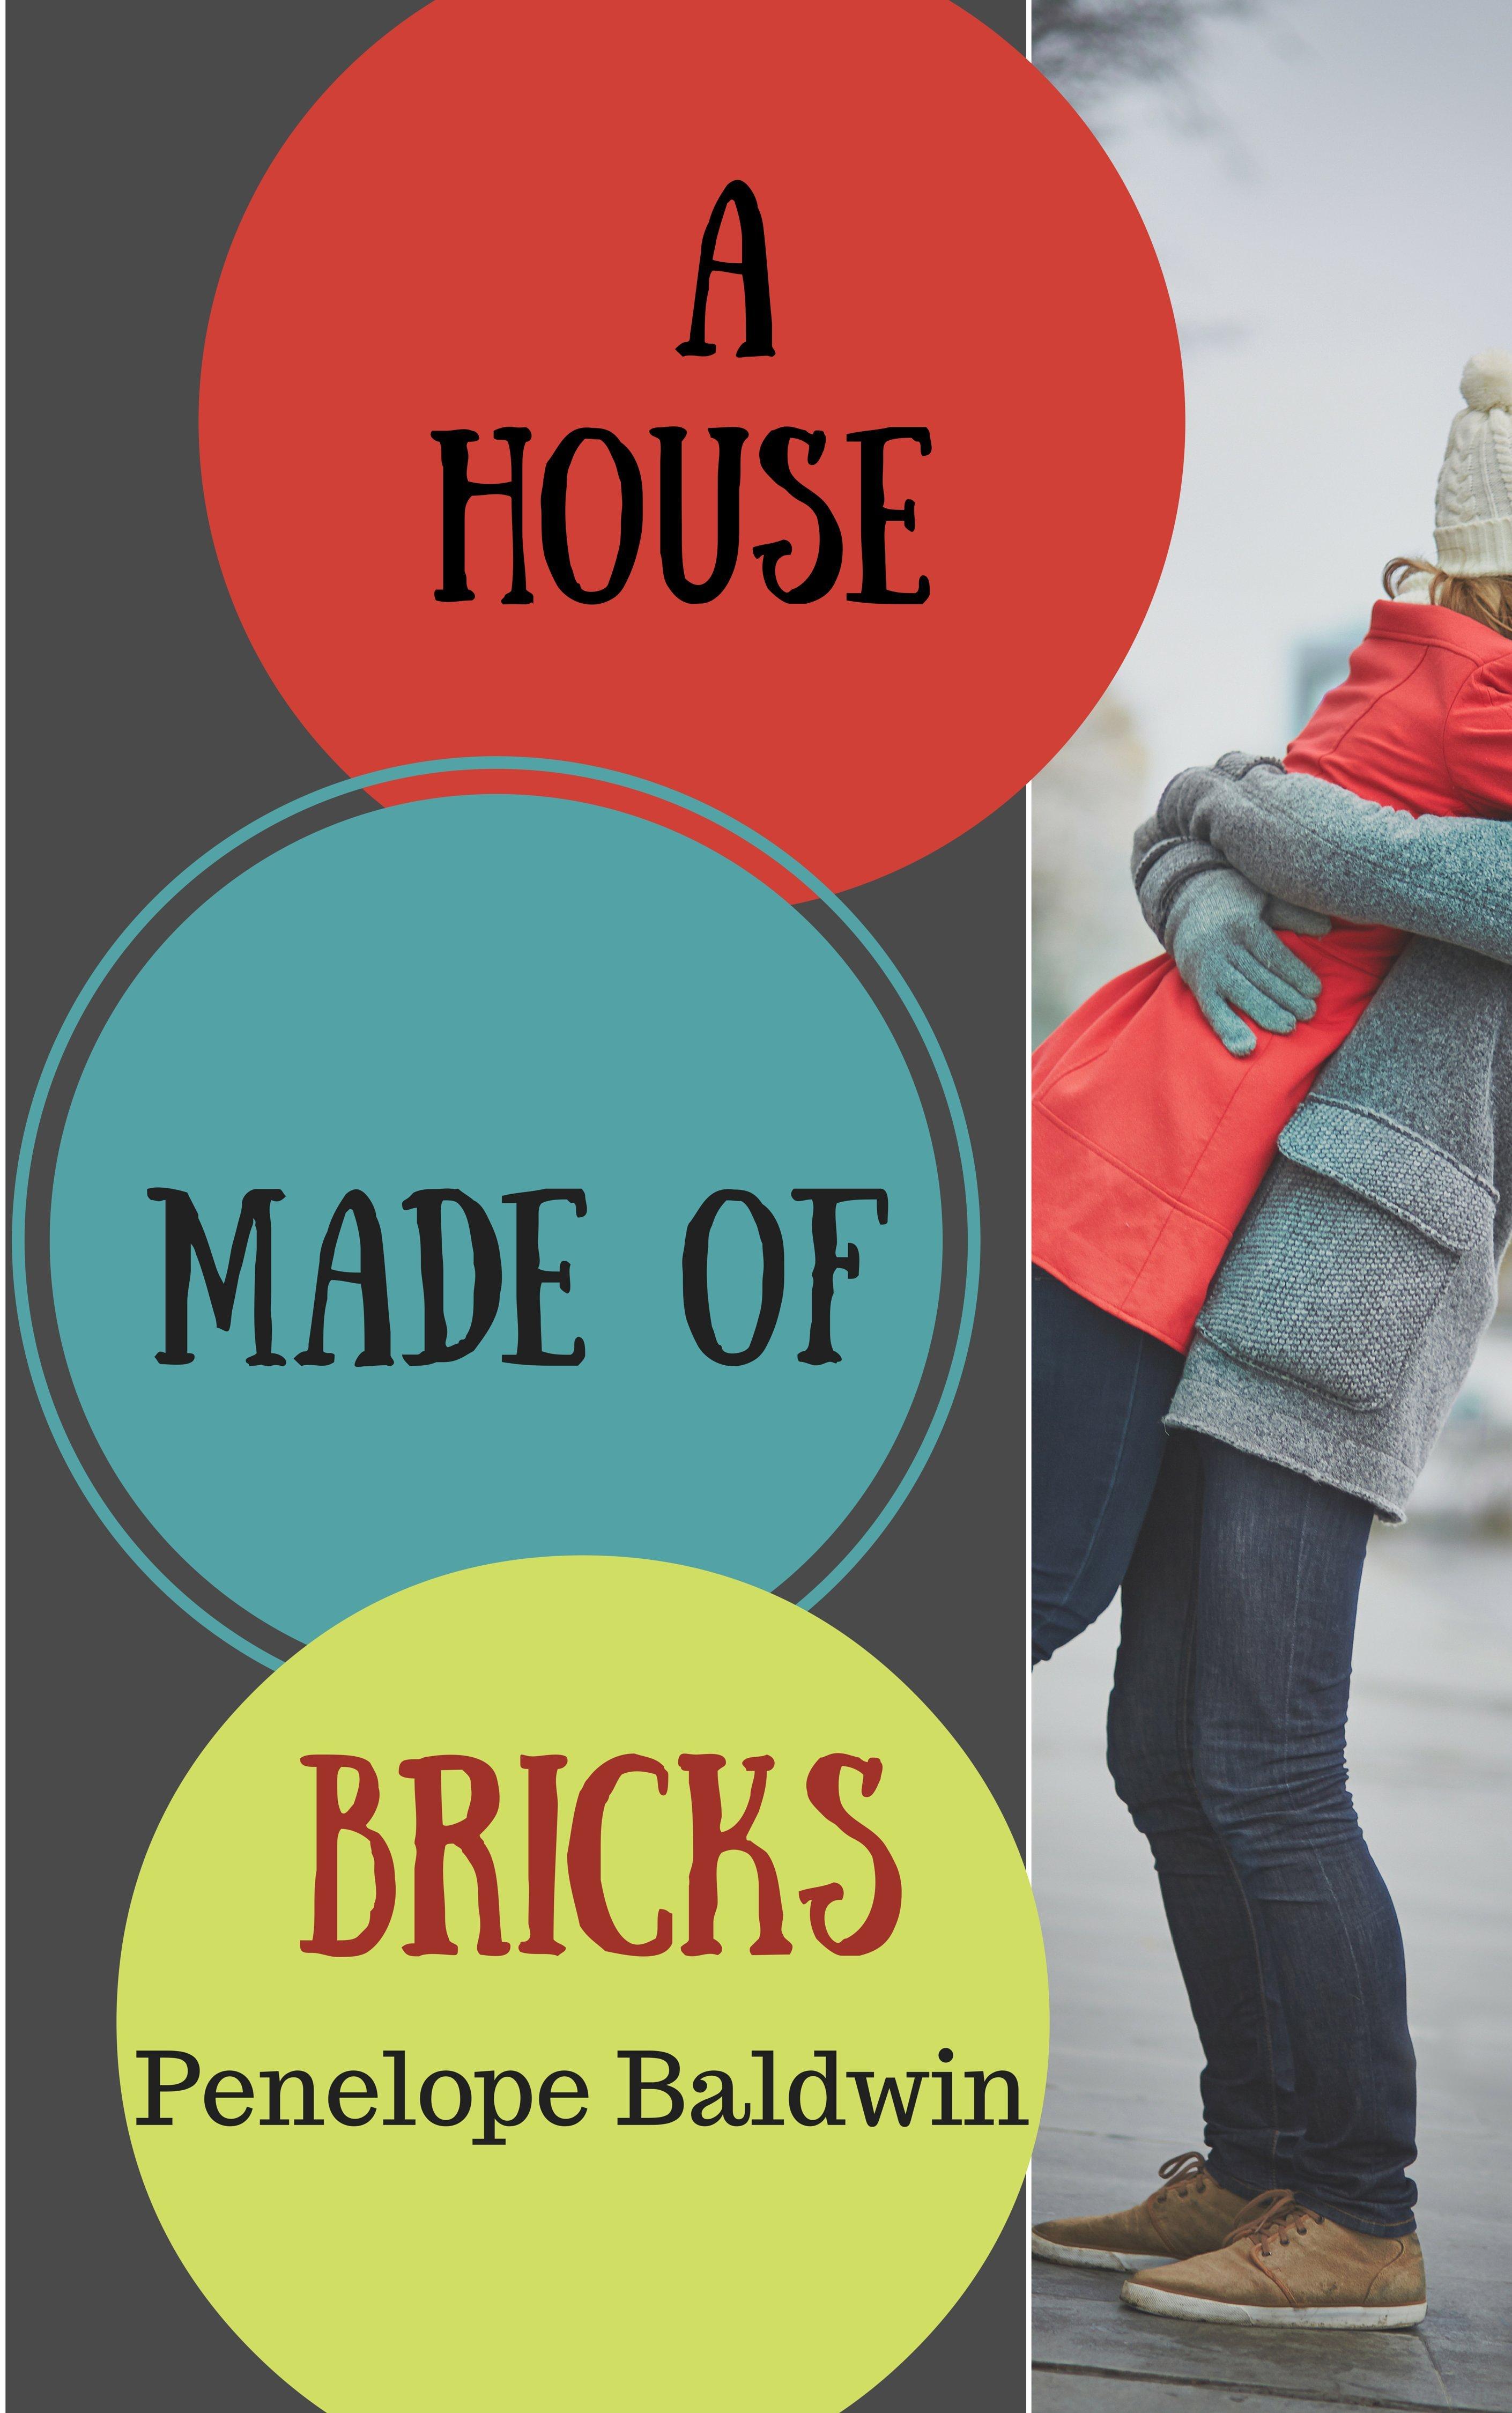 A House Made of Bricks Penelope Baldwin